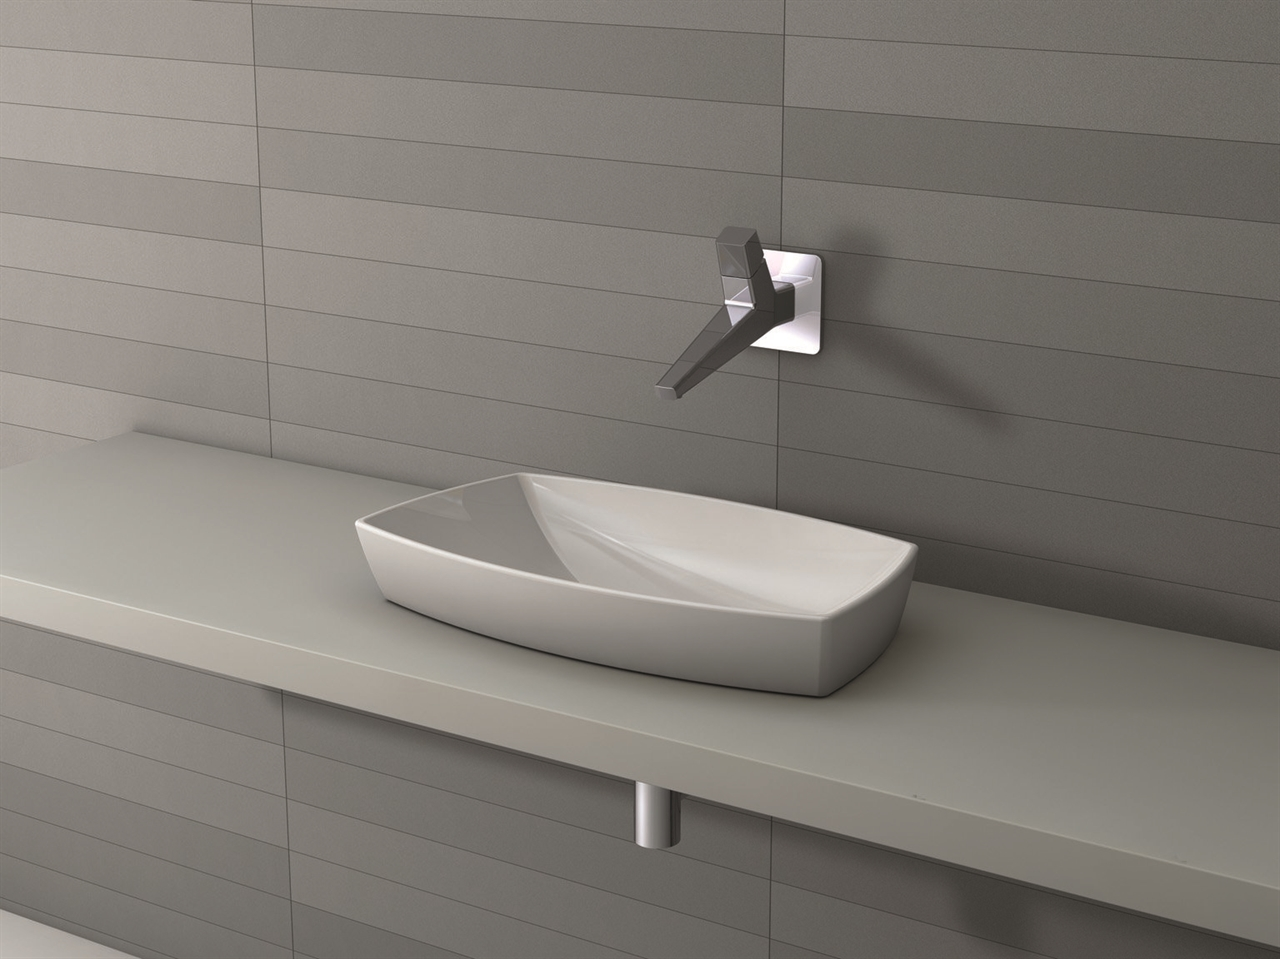 Pierdeco Design Sink - DADA – C53326 - Plavisdesign